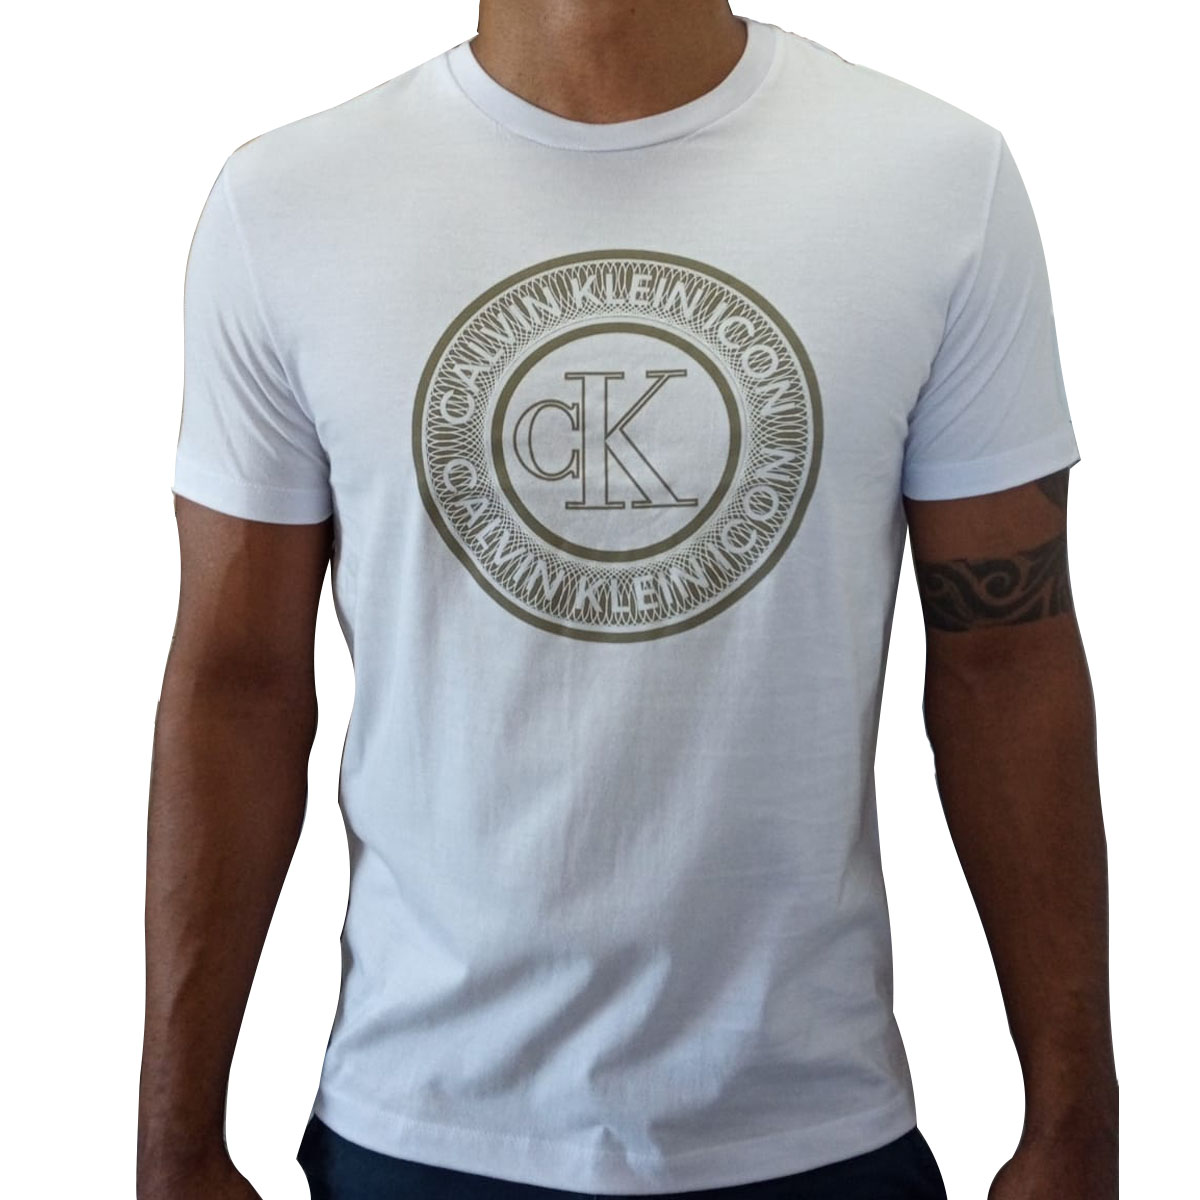 Camiseta Calvin Klein Careca Alg Icon Cotton Louge Branca